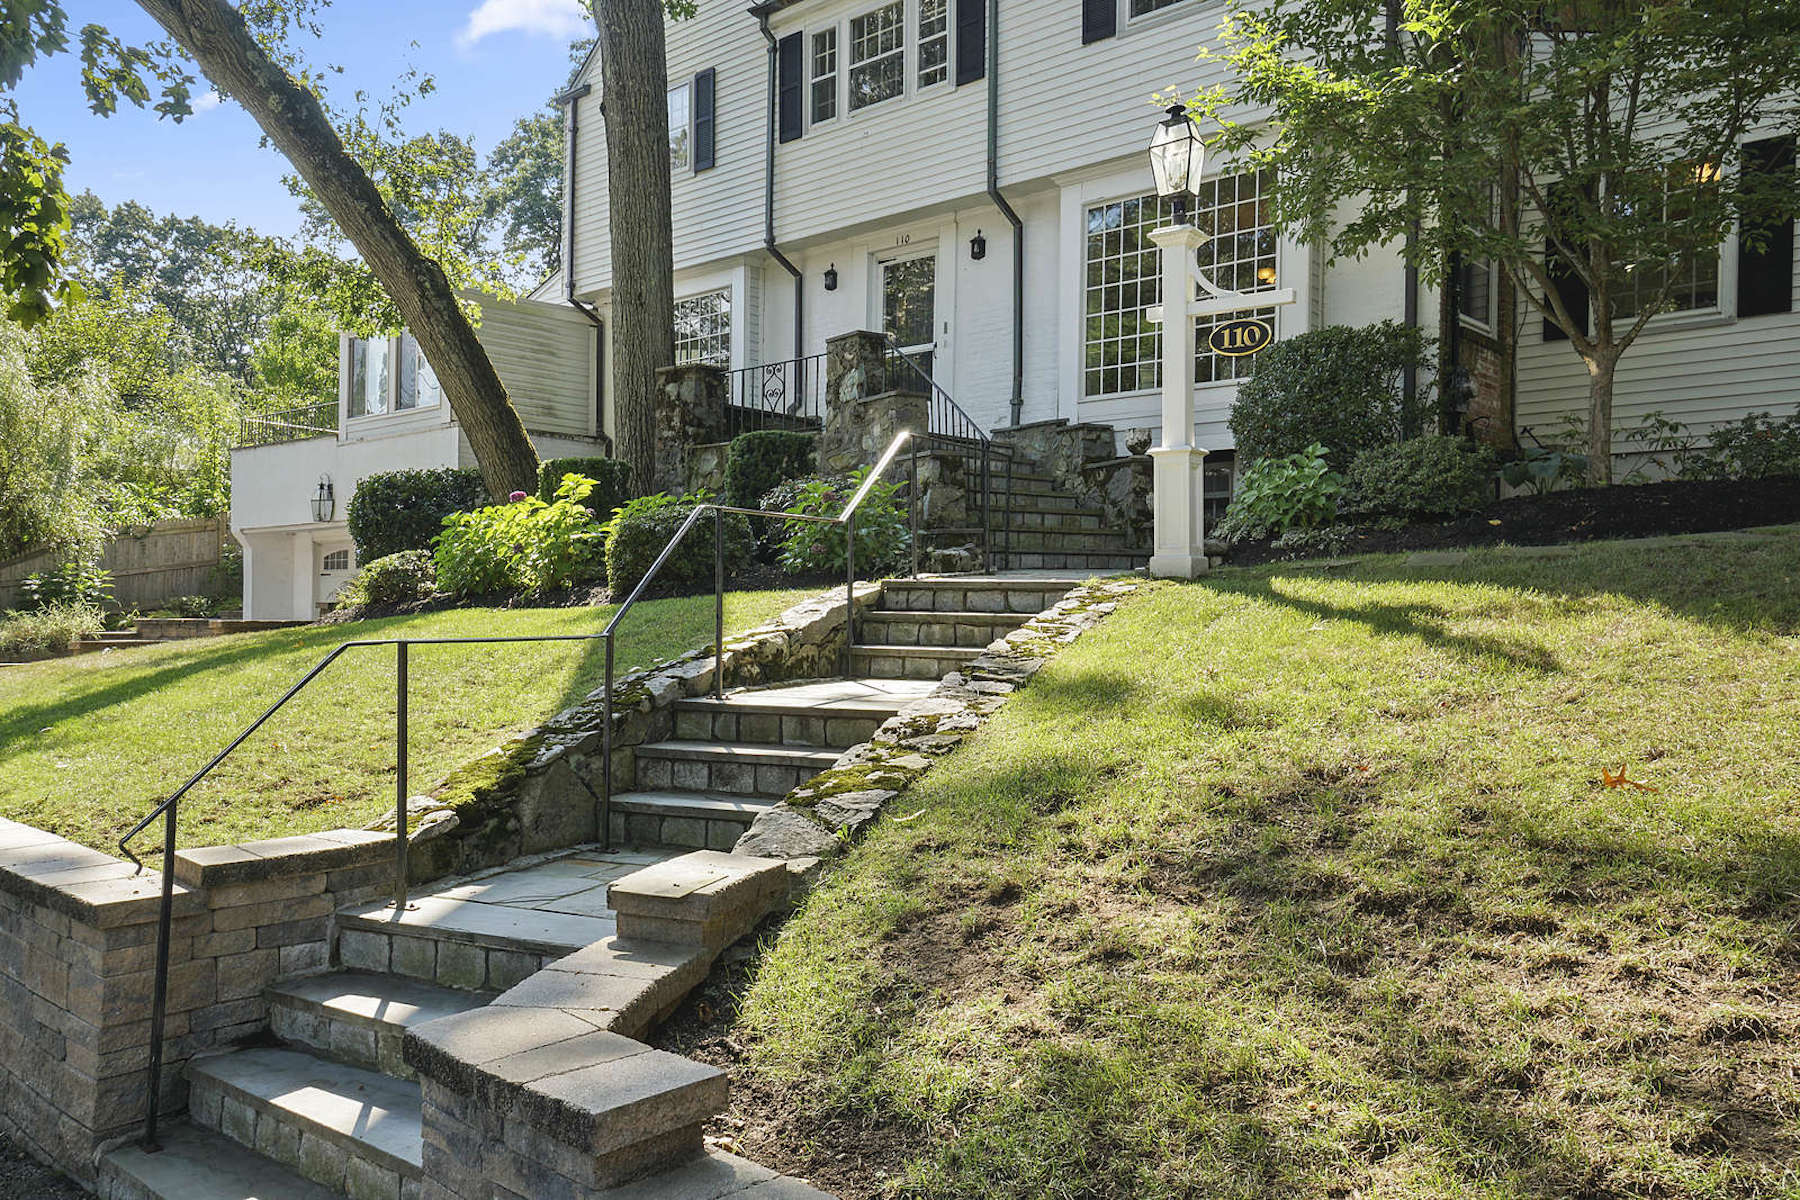 Single Family Homes for Sale at 110 Arlington Road Brookline, Massachusetts 02467 United States